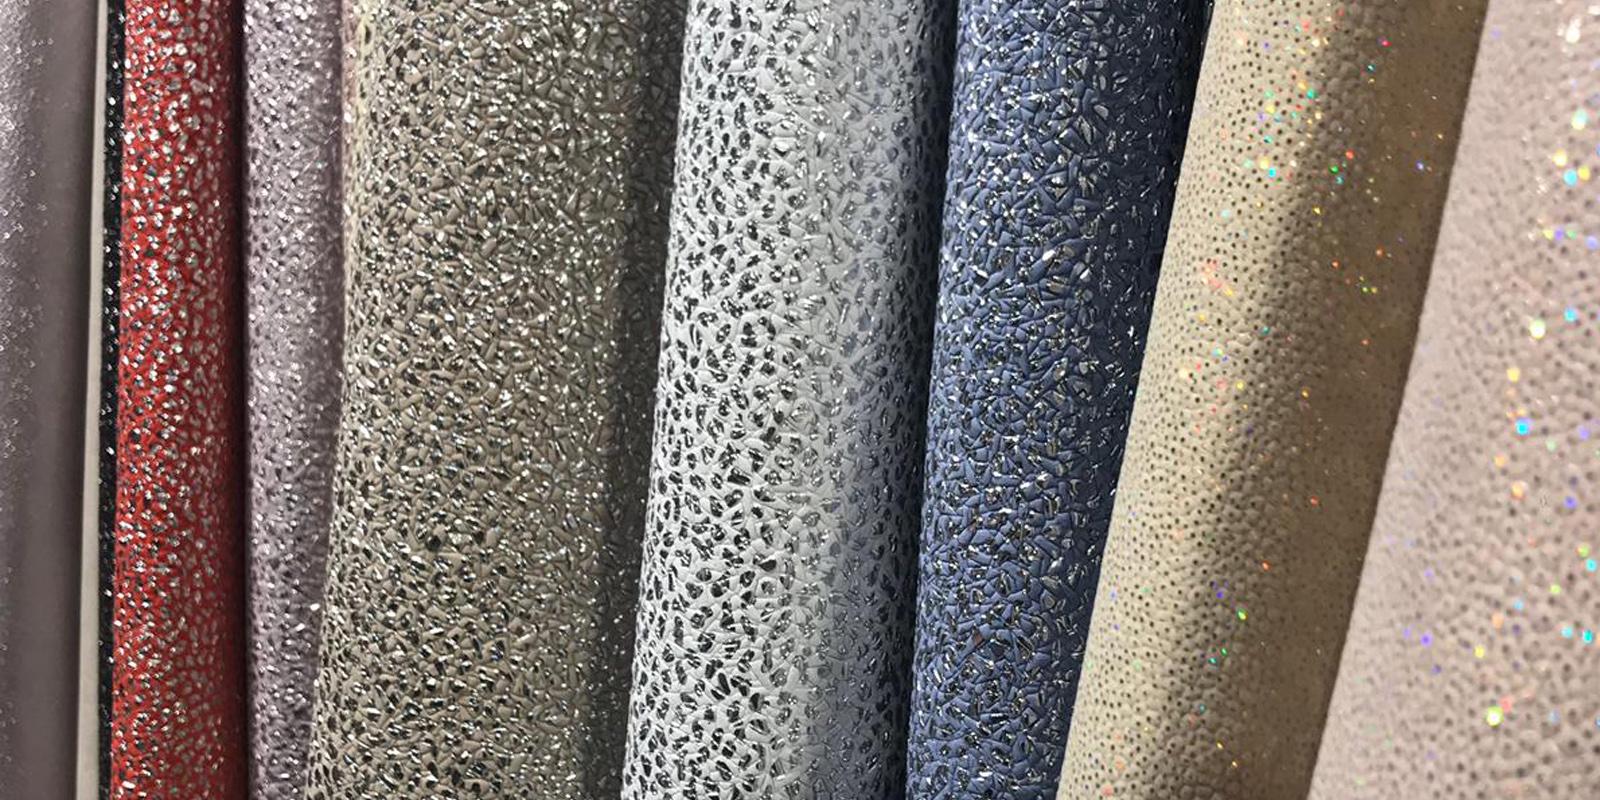 Lamine metallizzate parziali per pelli